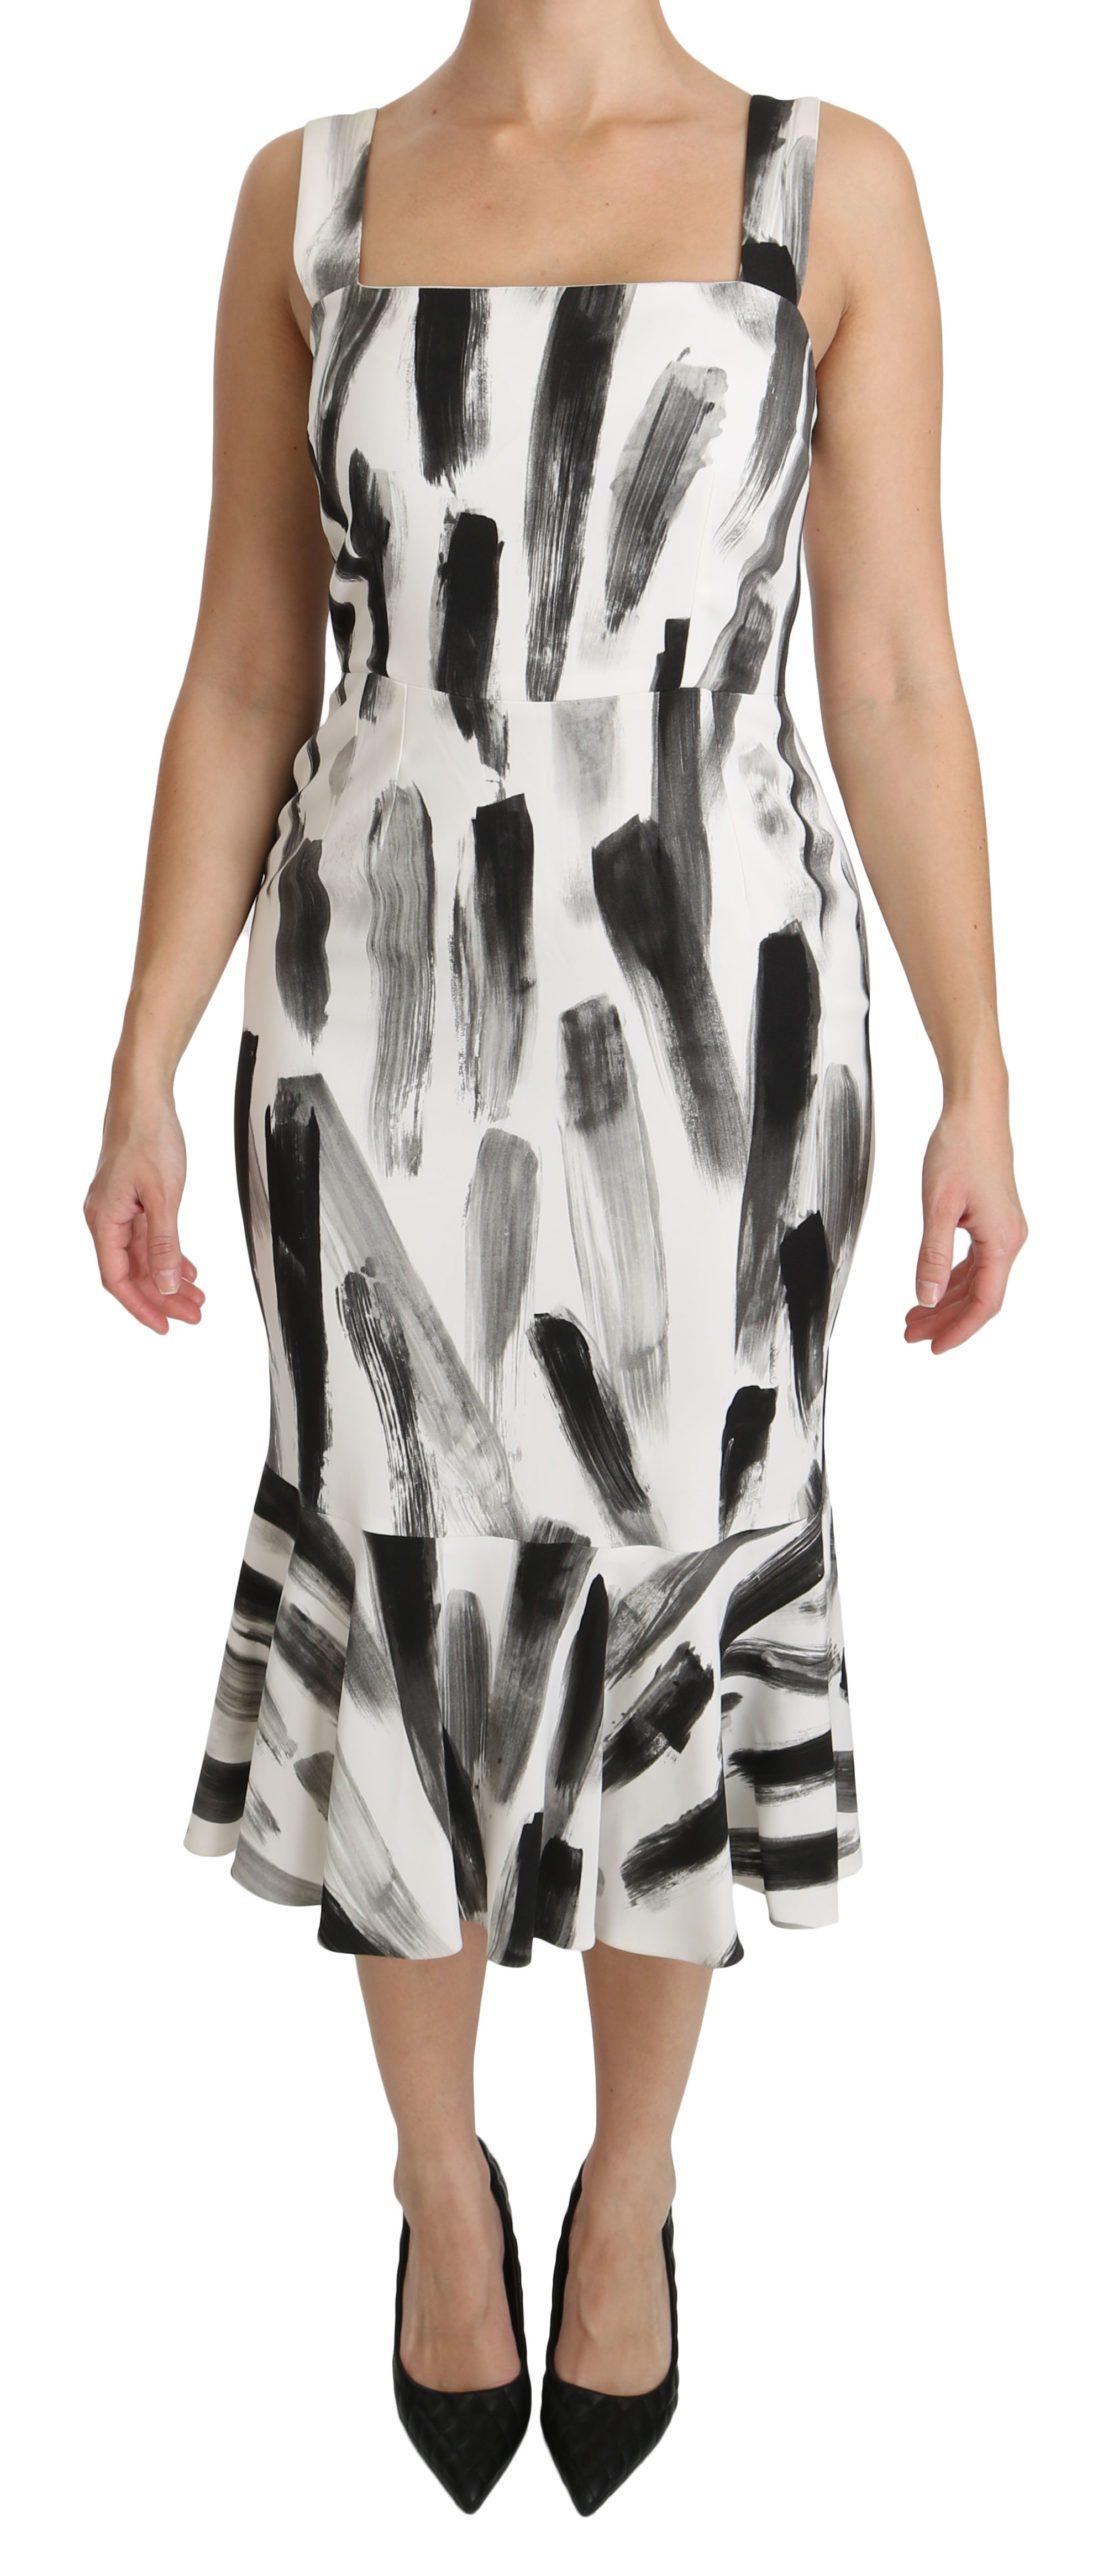 Dolce & Gabbana Women's Printed Sheath Midi Viscose Dress White DR2145 - IT42|M